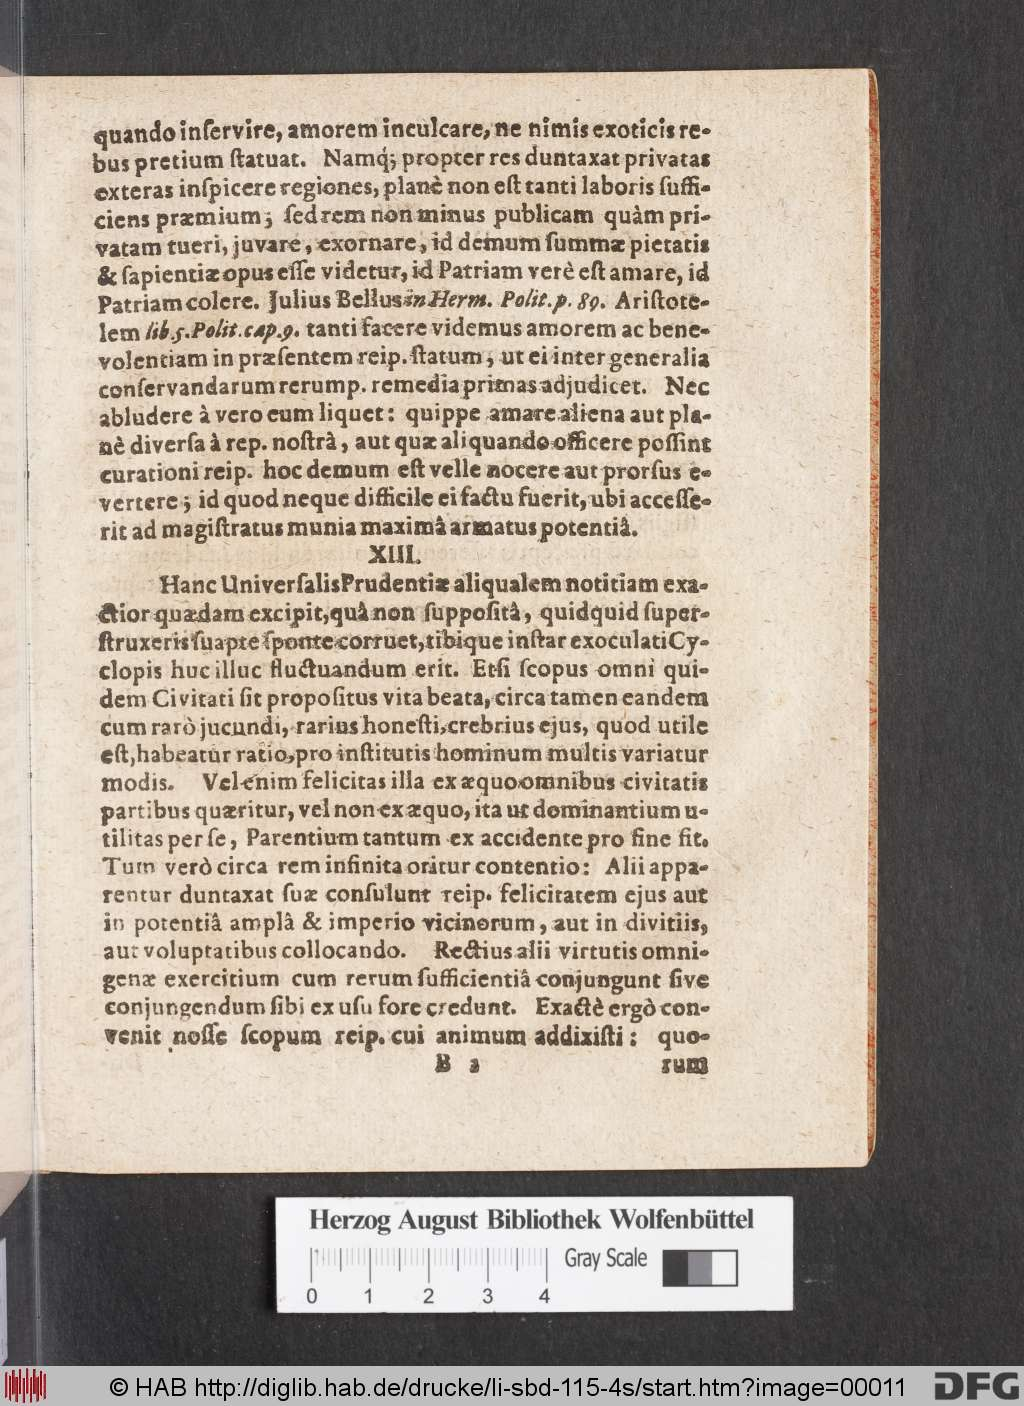 http://diglib.hab.de/drucke/li-sbd-115-4s/00011.jpg